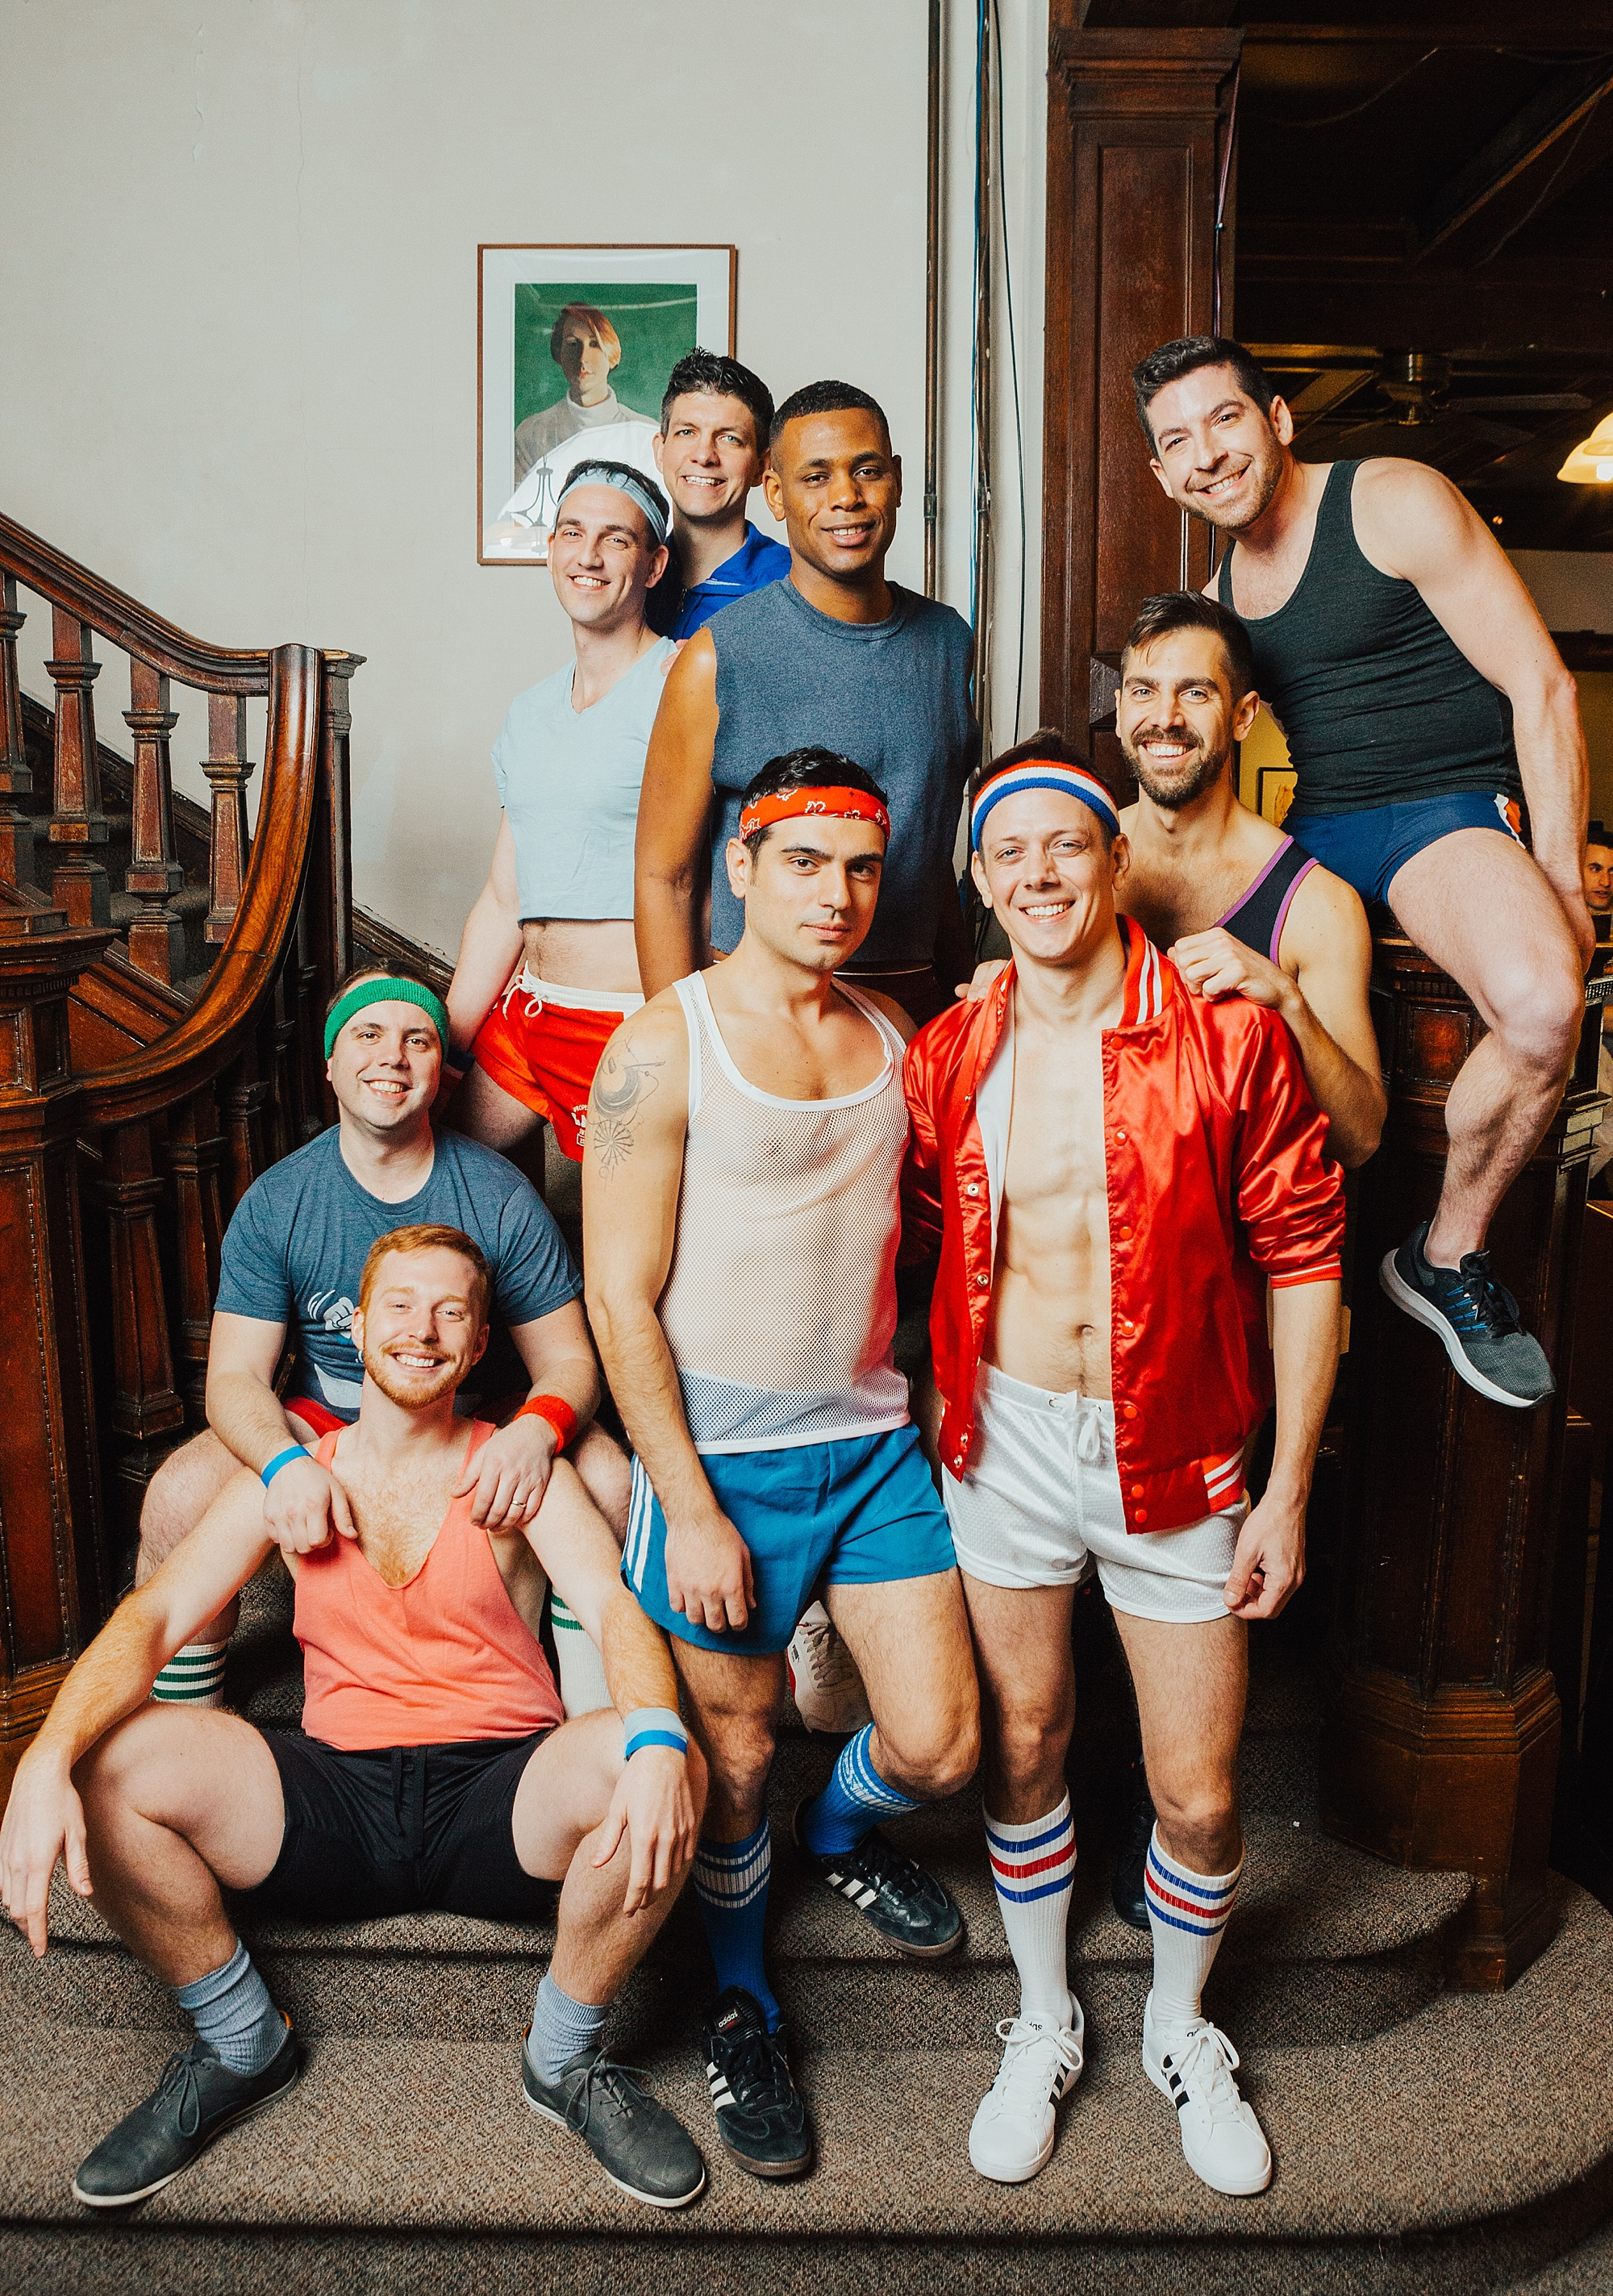 Joe_Mac_Creative_LGBT_Photographer_Philadelphia_Gay_Business__0066.jpg